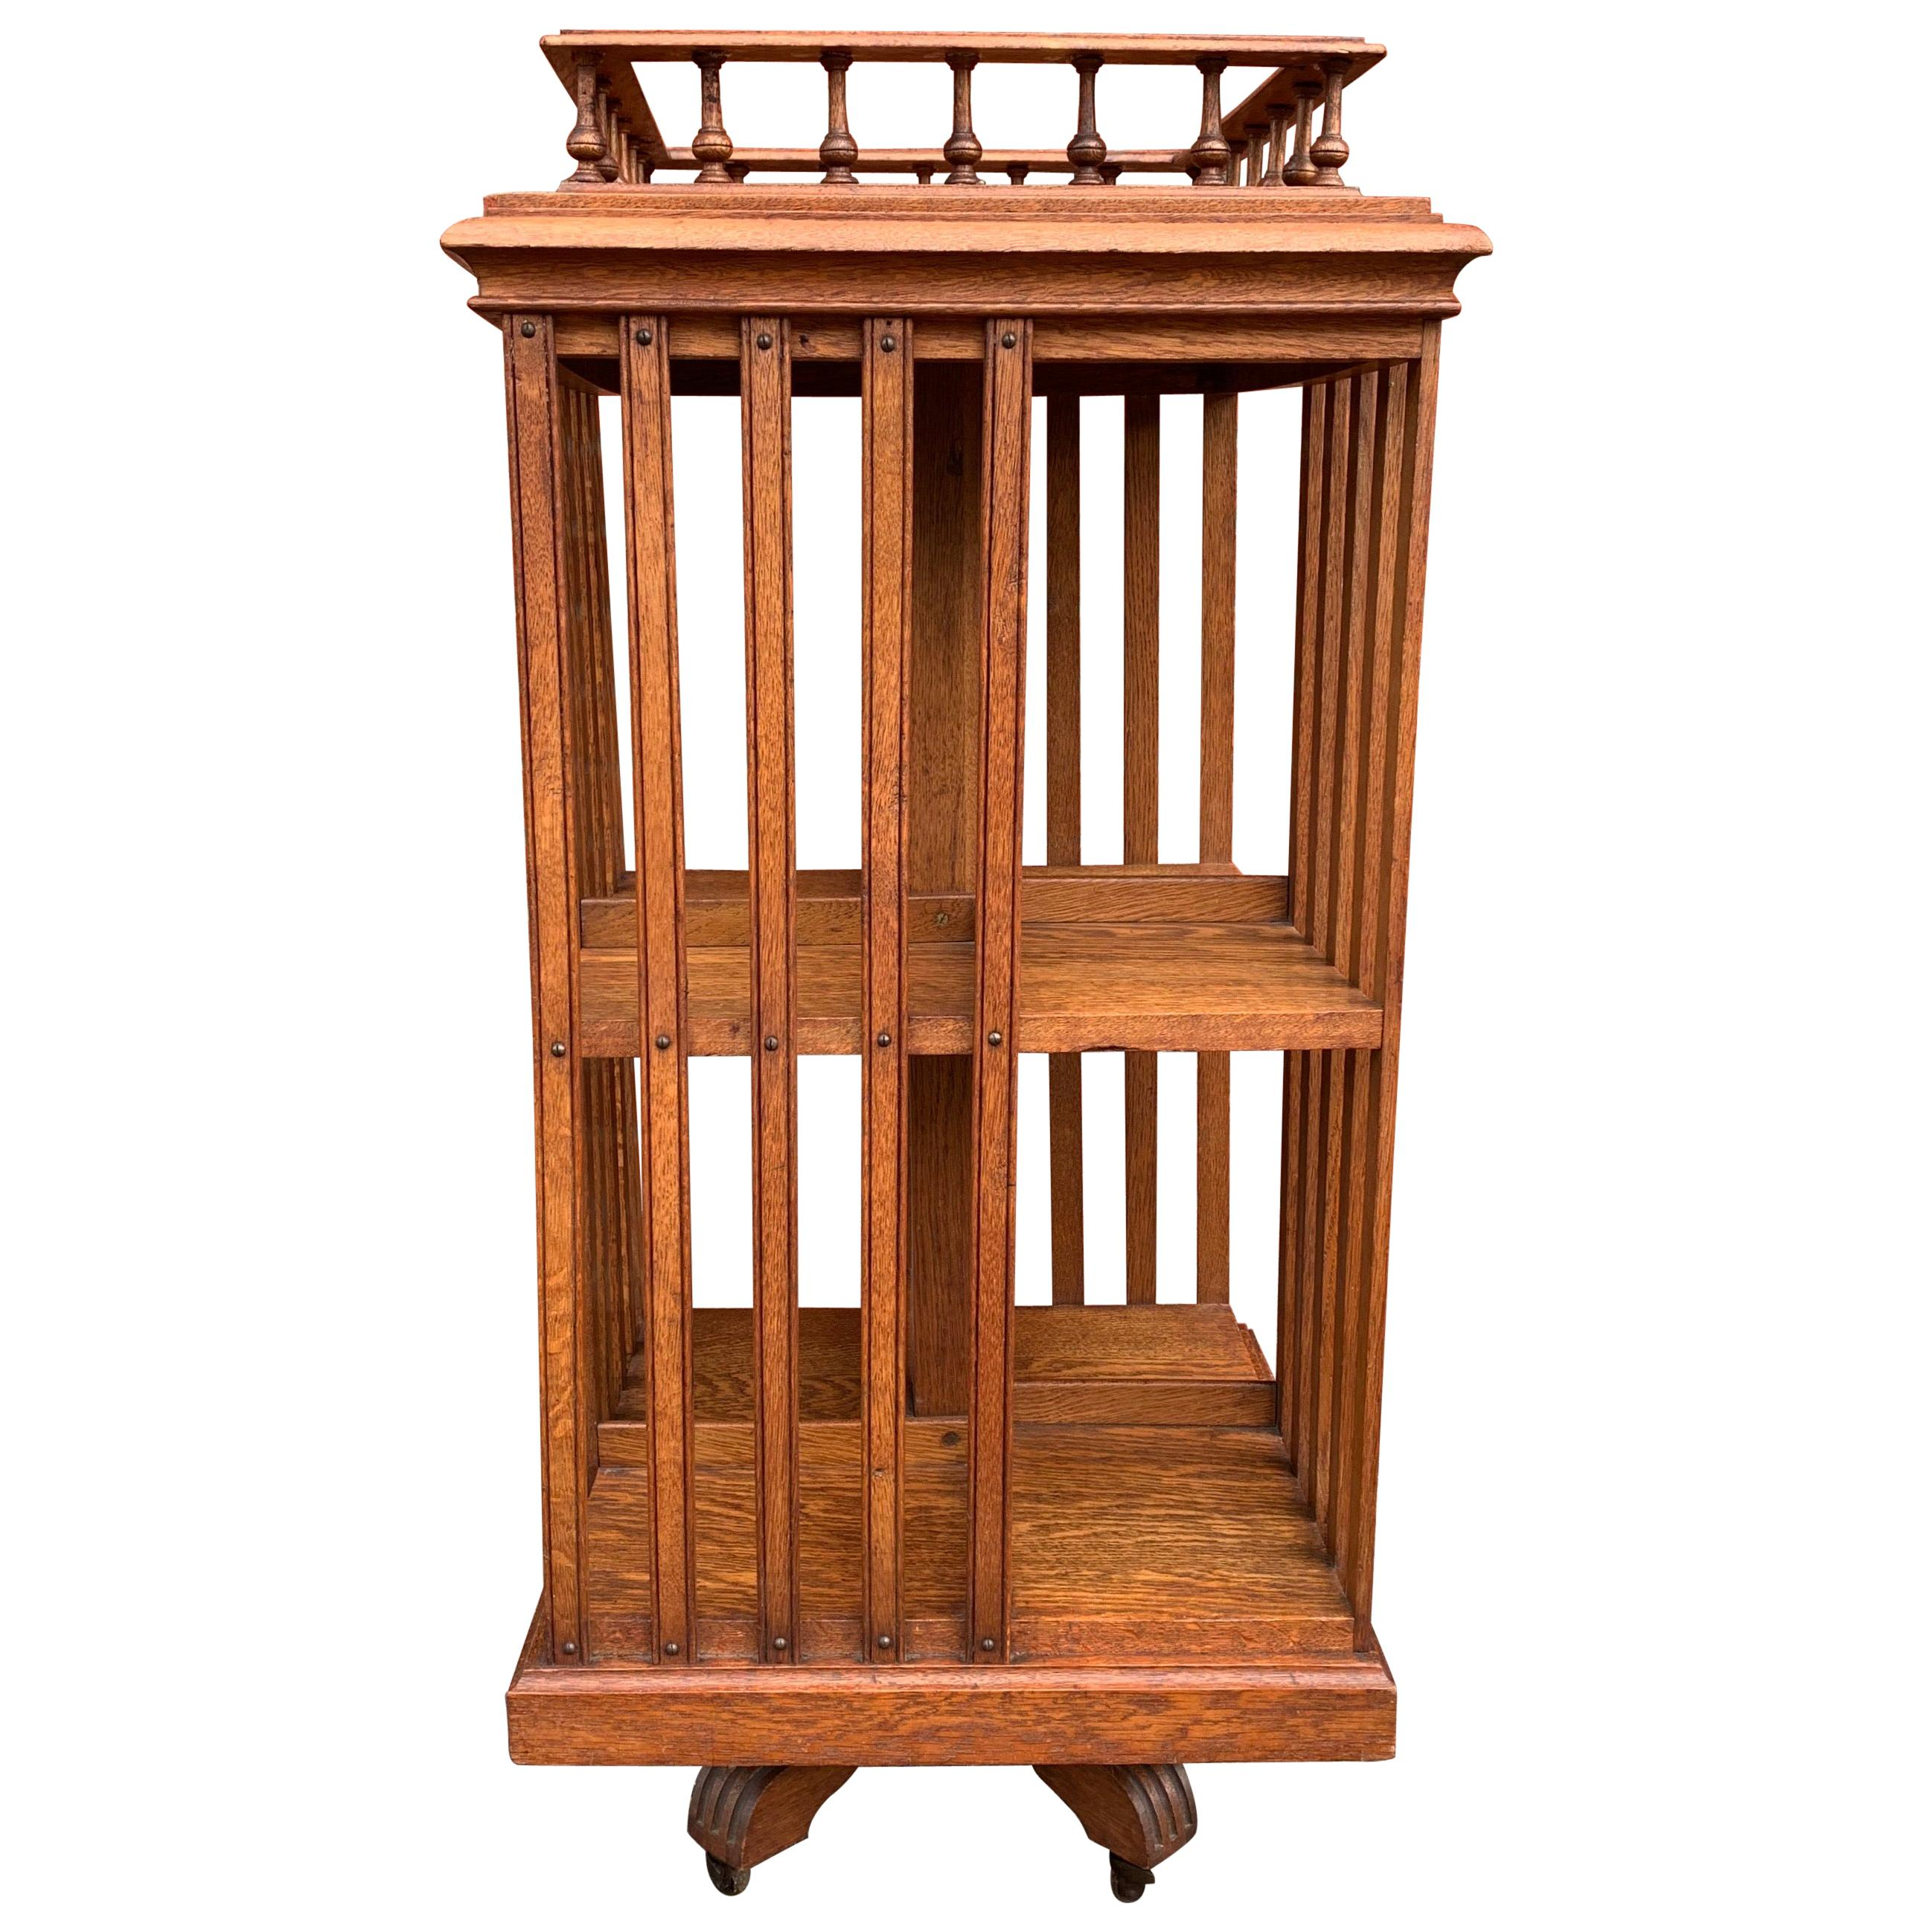 Antique & Good Size Early 1900s Tiger Oak Revolving Bookcase on Original Wheels